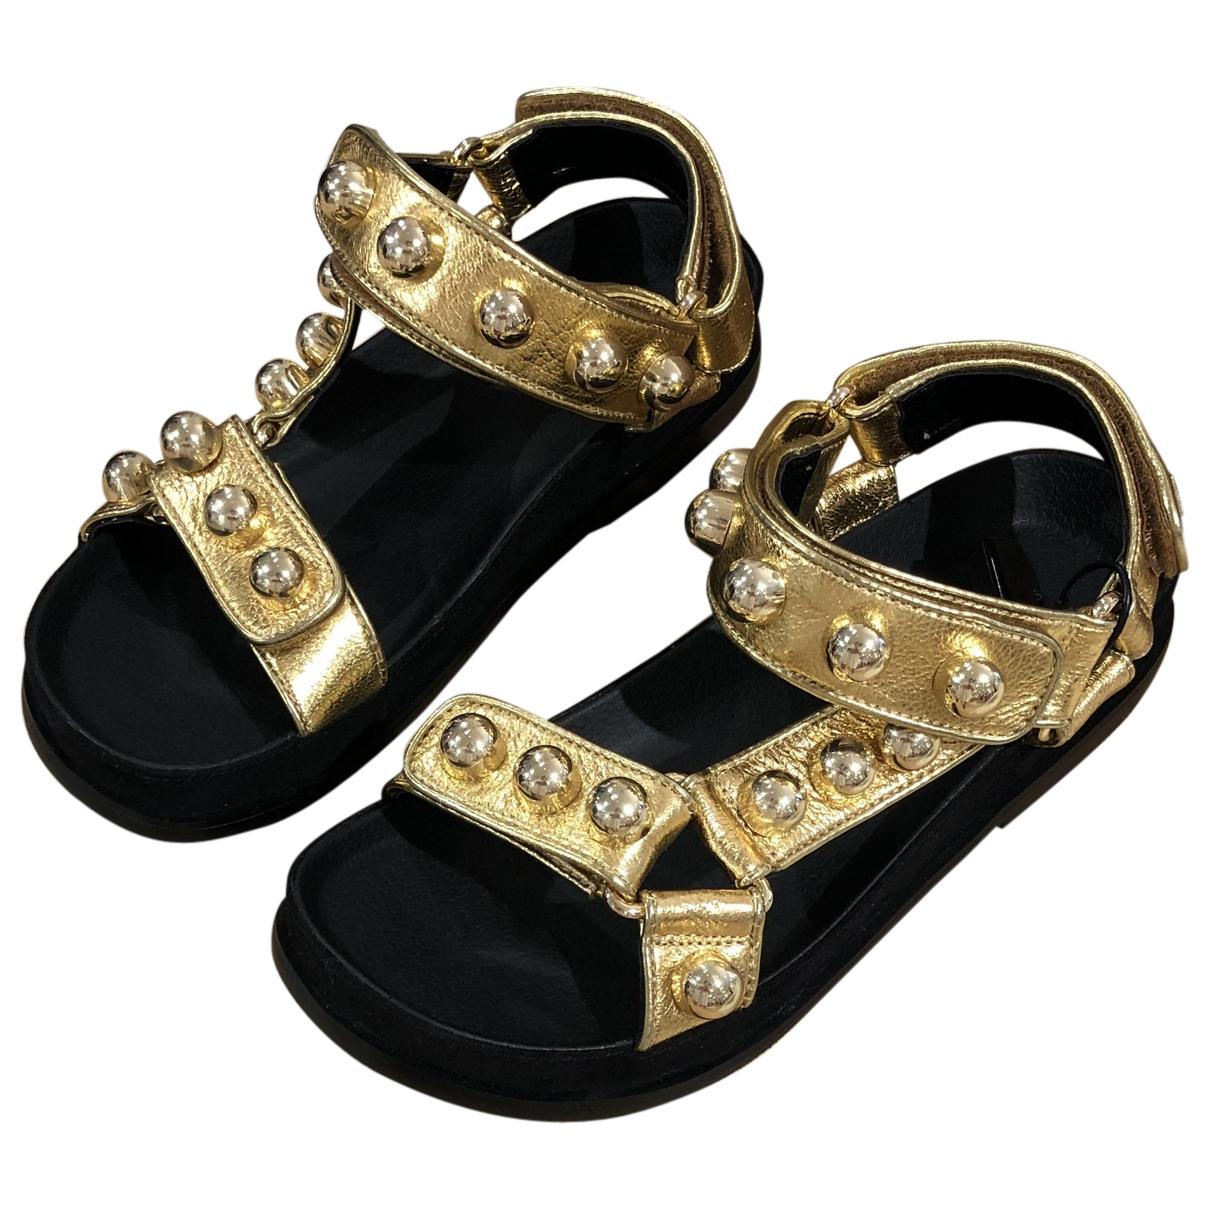 Sandro Spring Summer 2020 Gold Leather Sandals for Women 38 EU